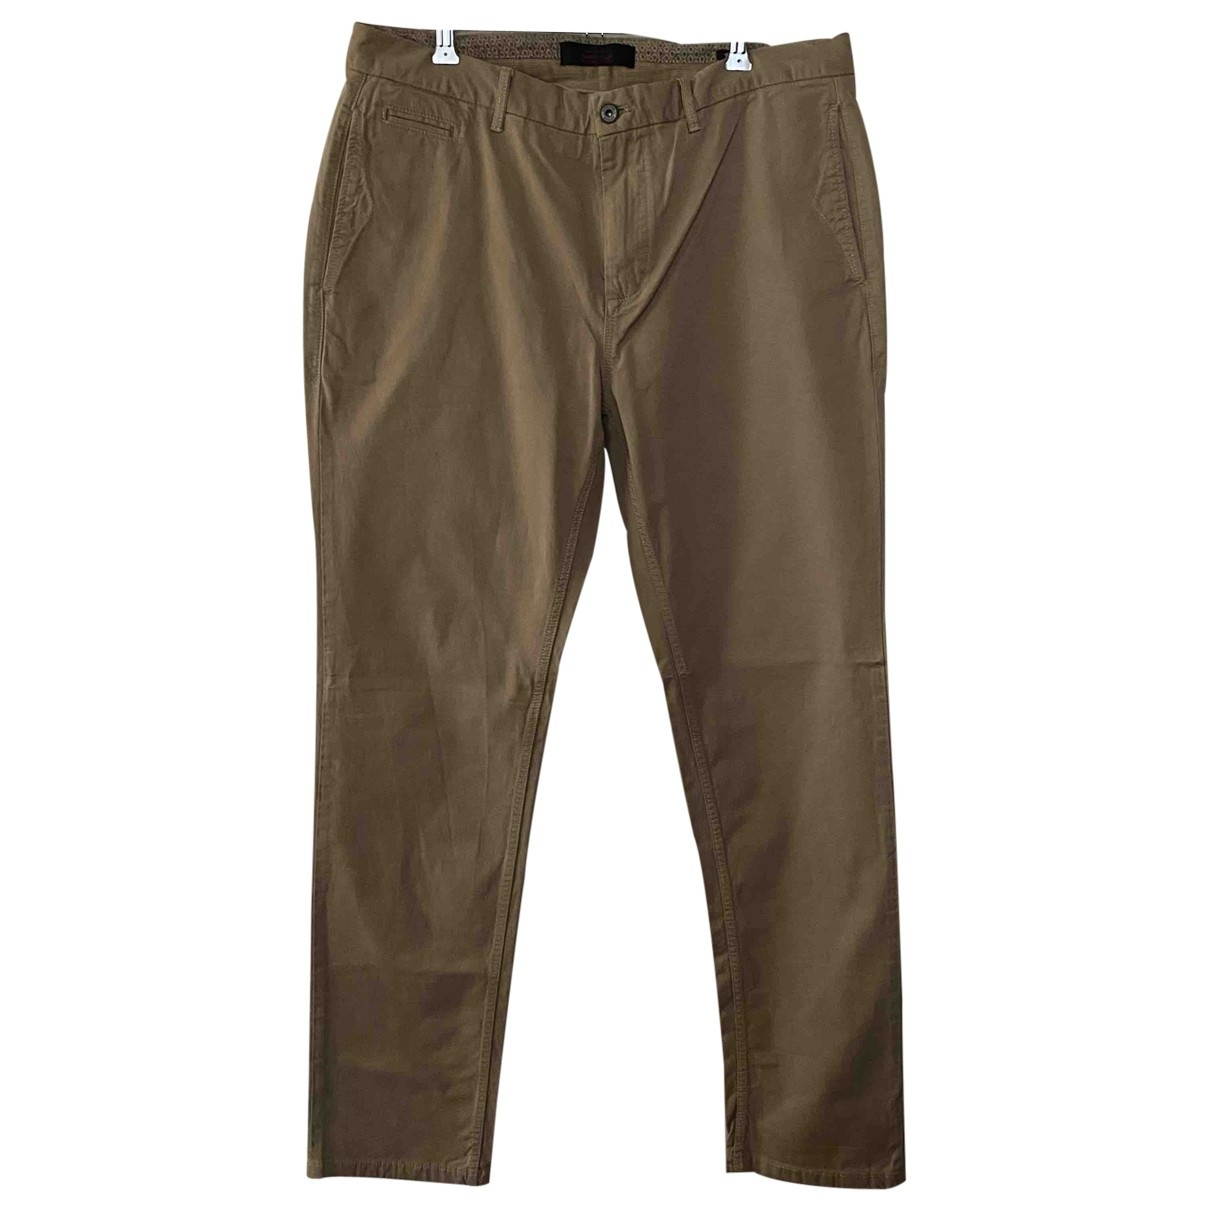 Scotch & Soda \N Beige Cotton Trousers for Men 34 UK - US